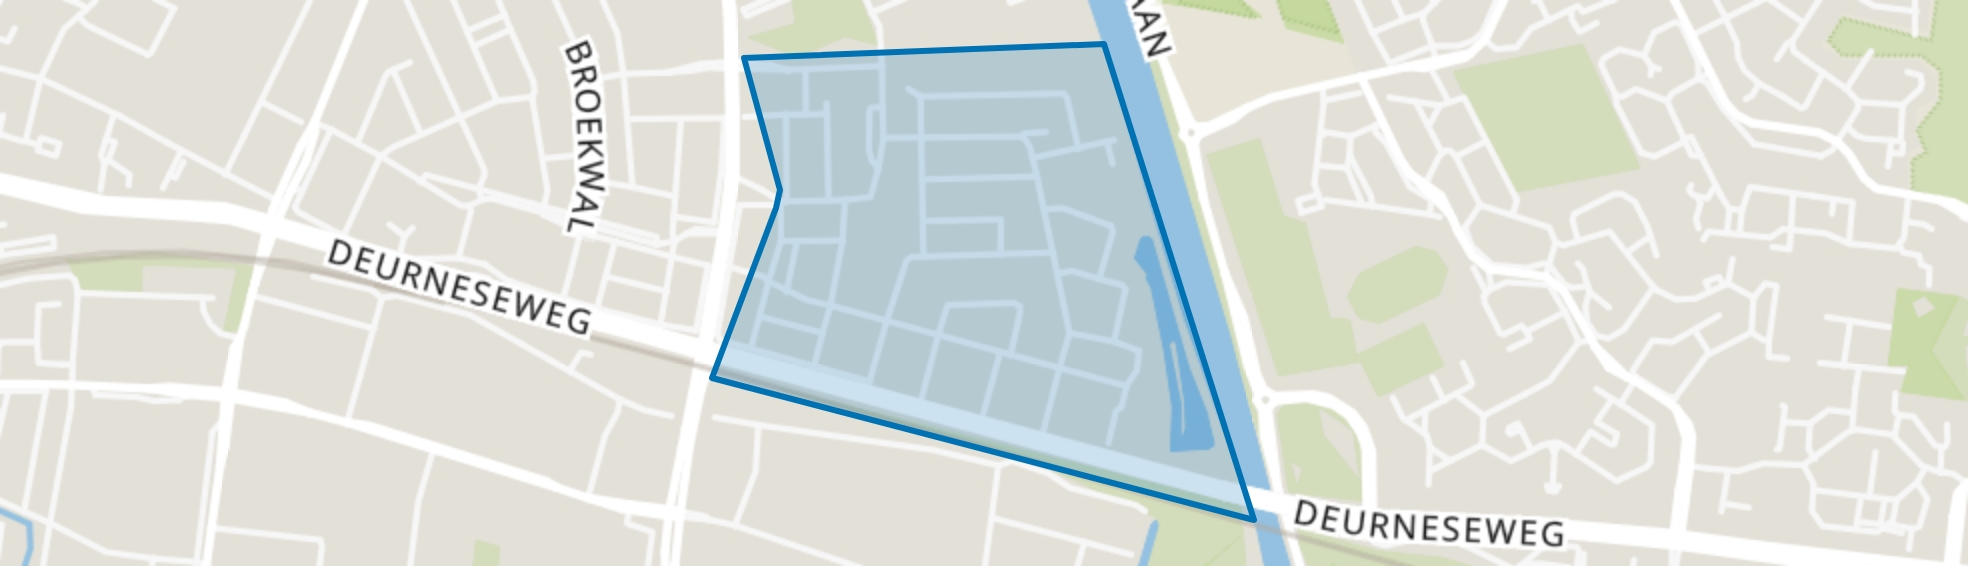 Beisterveldse Broek, Helmond map